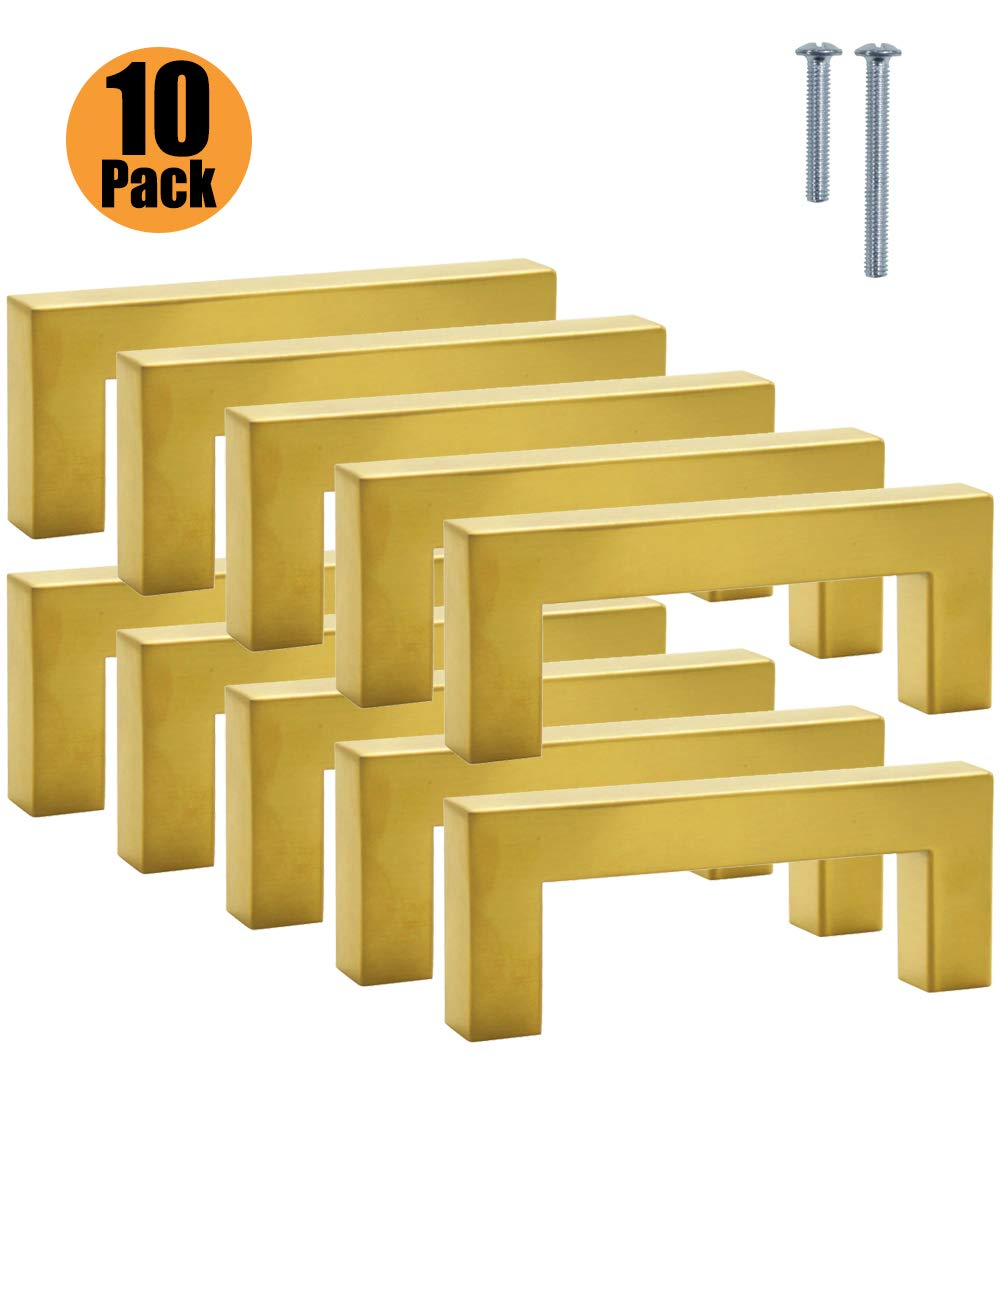 acero inoxidable PinLin 10 Pack acero inoxidable Tiradores para puerta de armario de cocina Hole Centre 96mm 12 mm de ancho color dorado